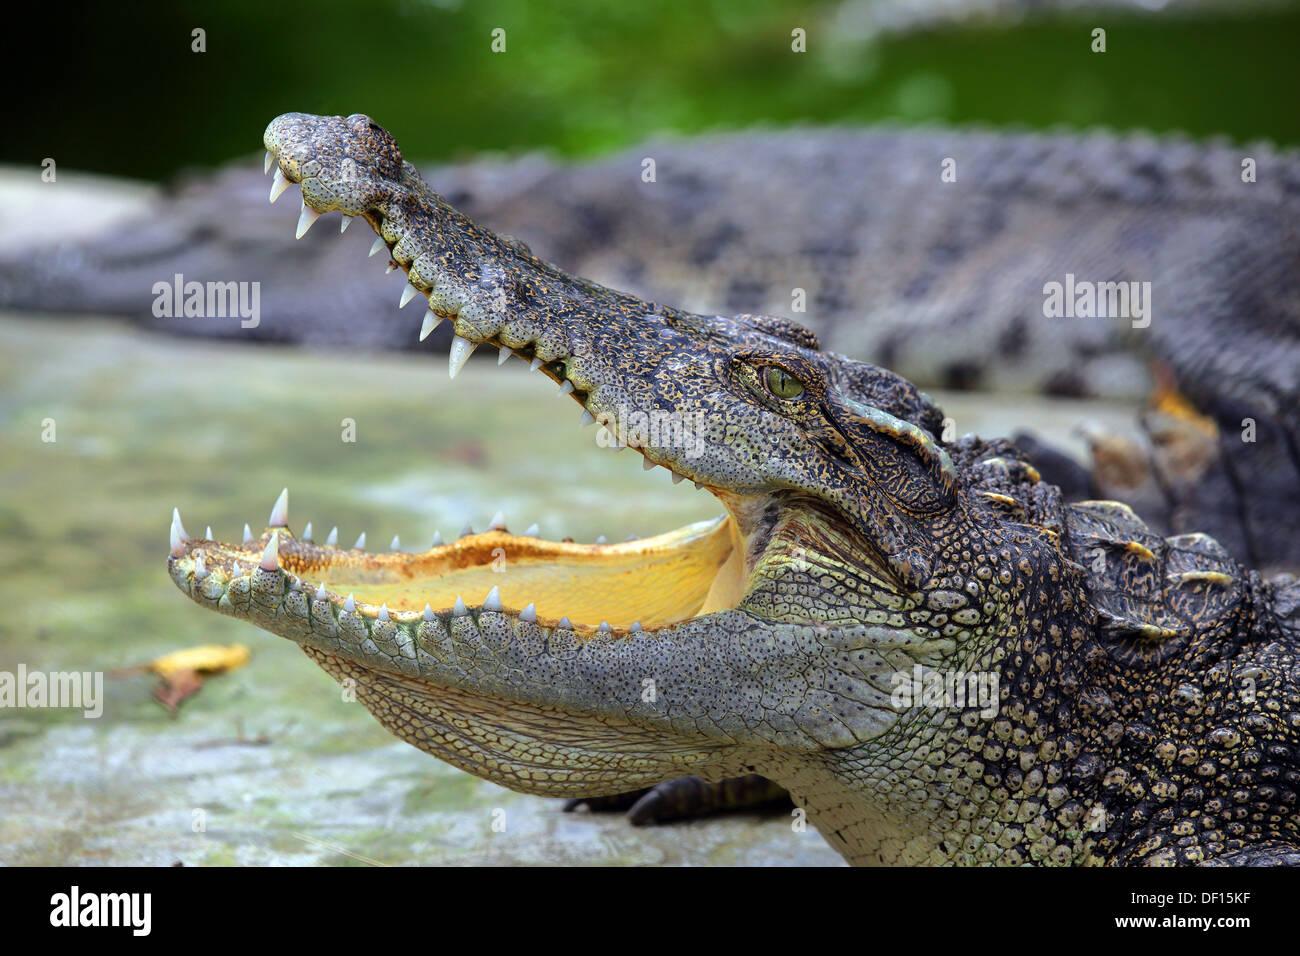 Krokodil mit Backen öffnen Stockbild